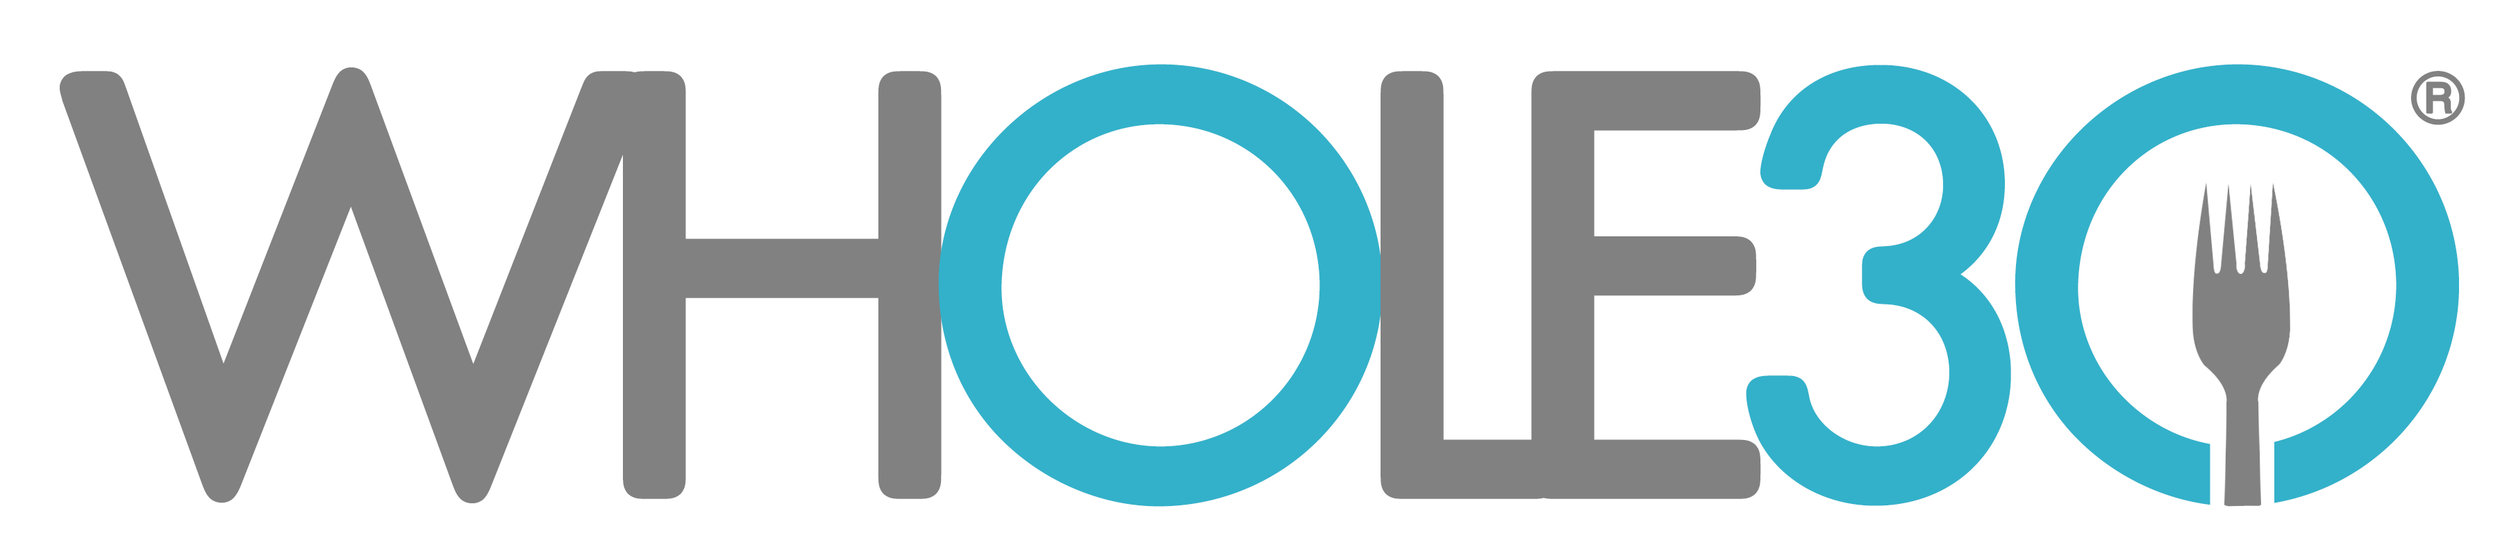 Whole 30 logo.jpg